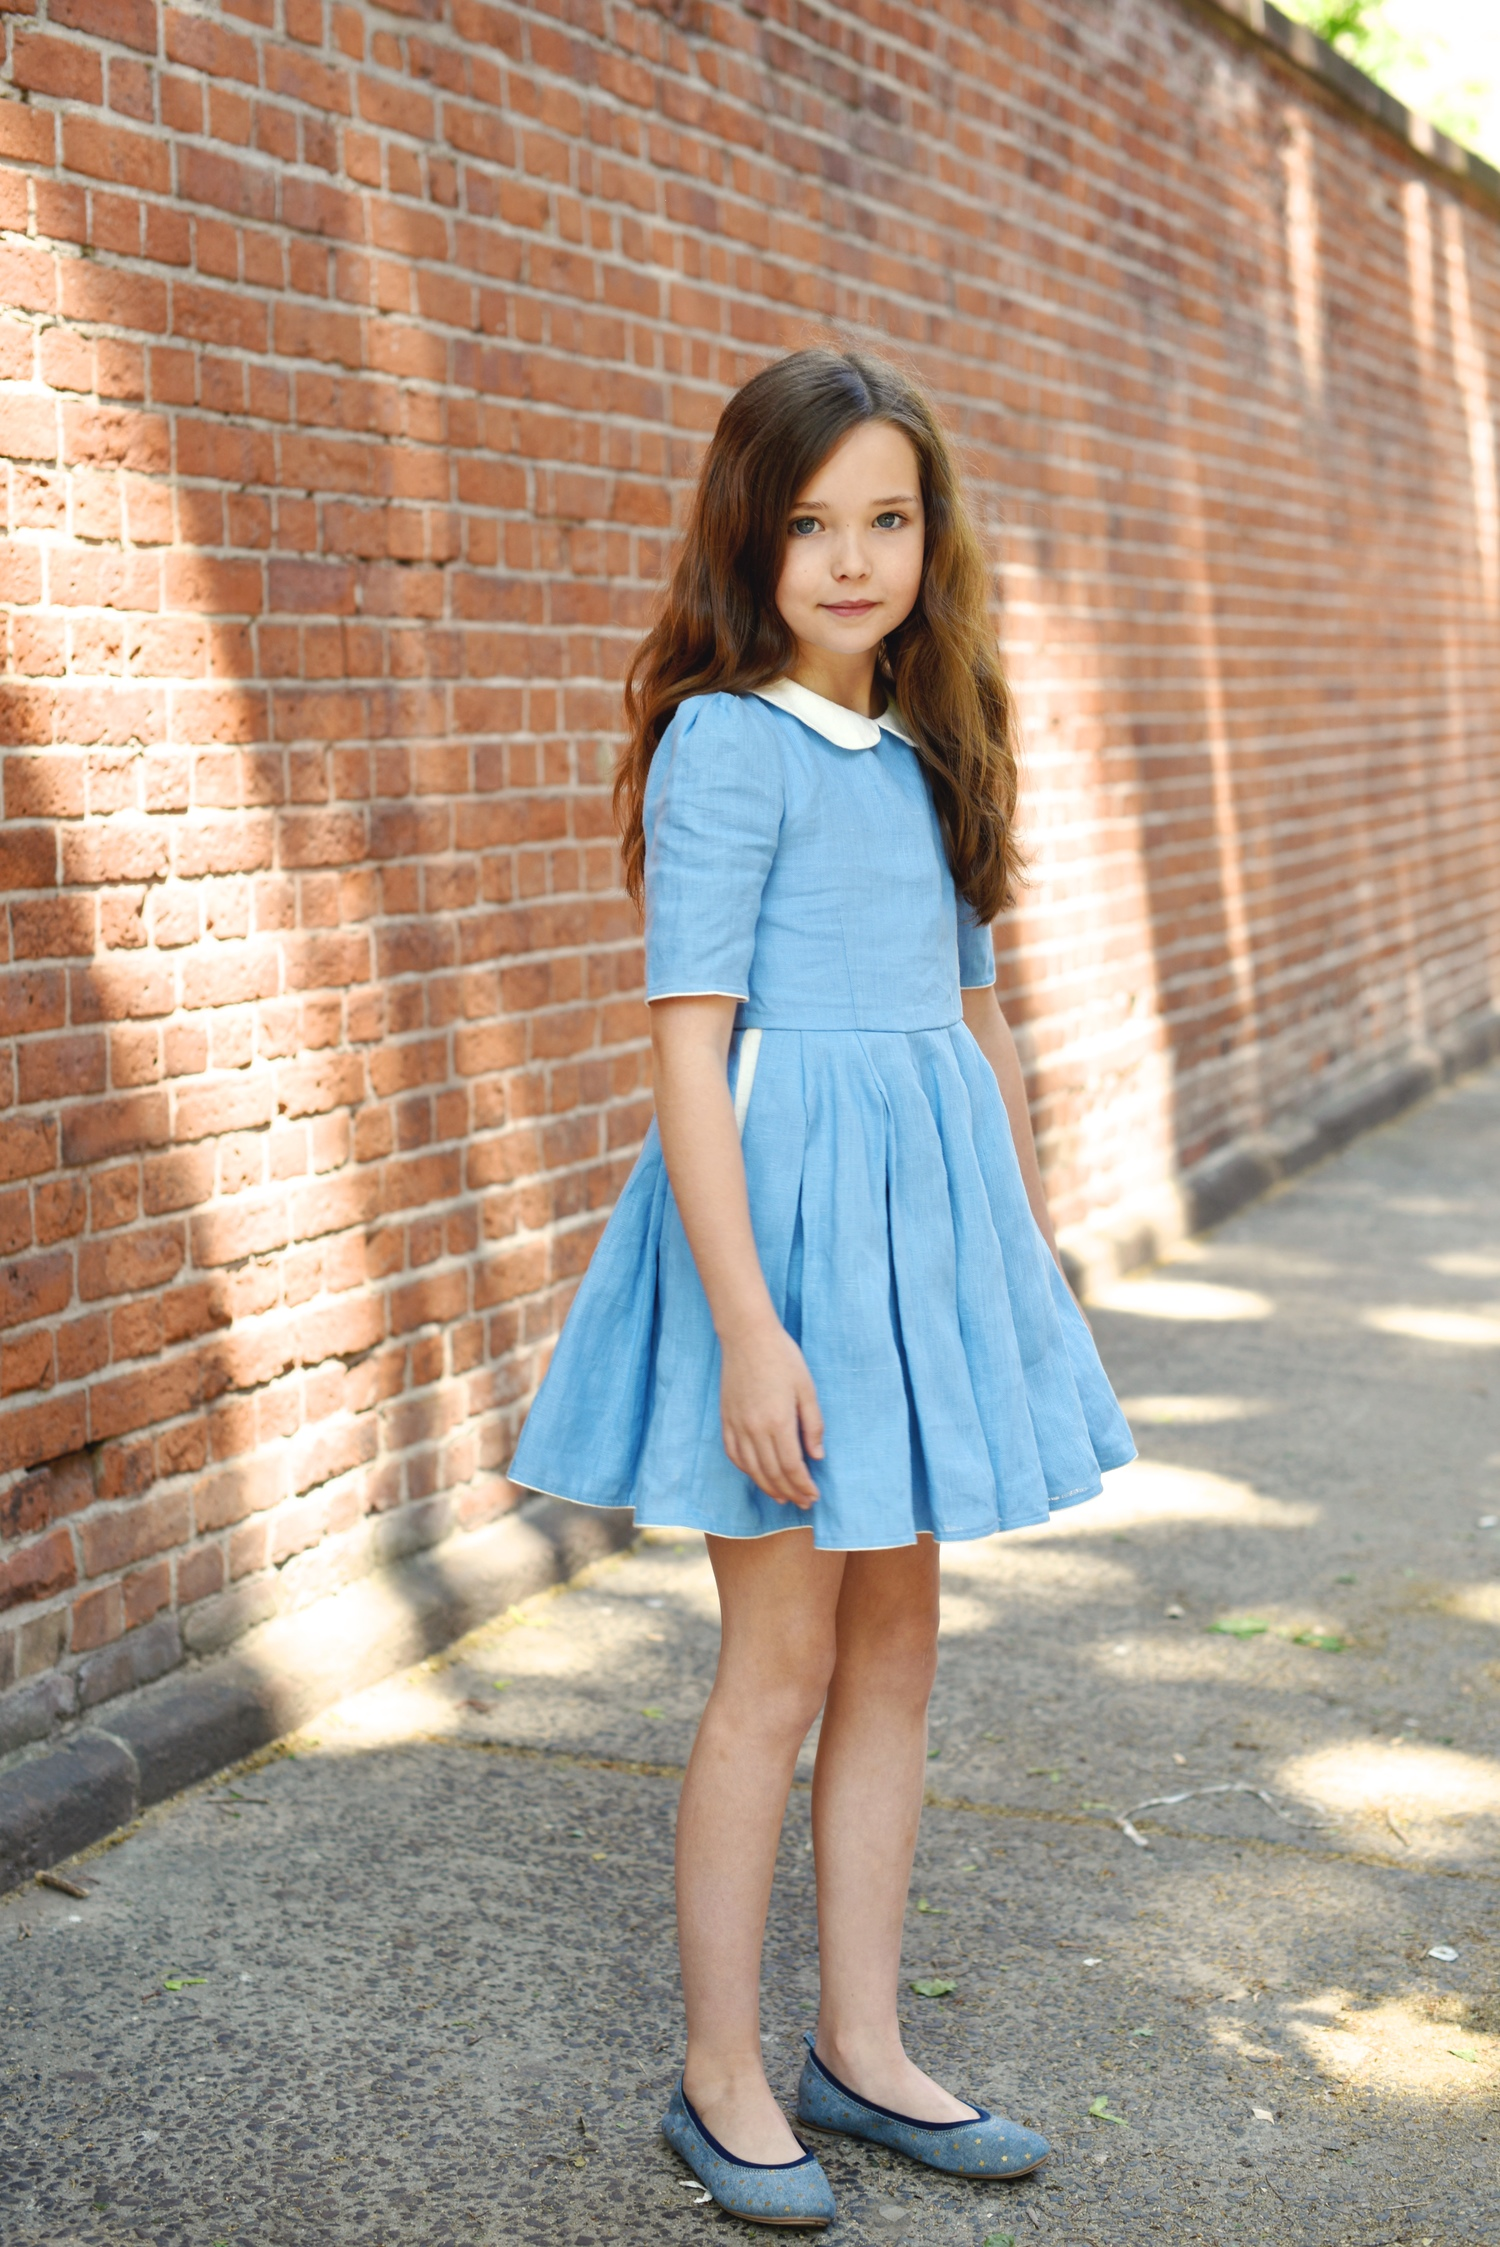 Enfant+Street+Style+by+Gina+Kim+Photography+Paade+Mode+Dress.jpeg